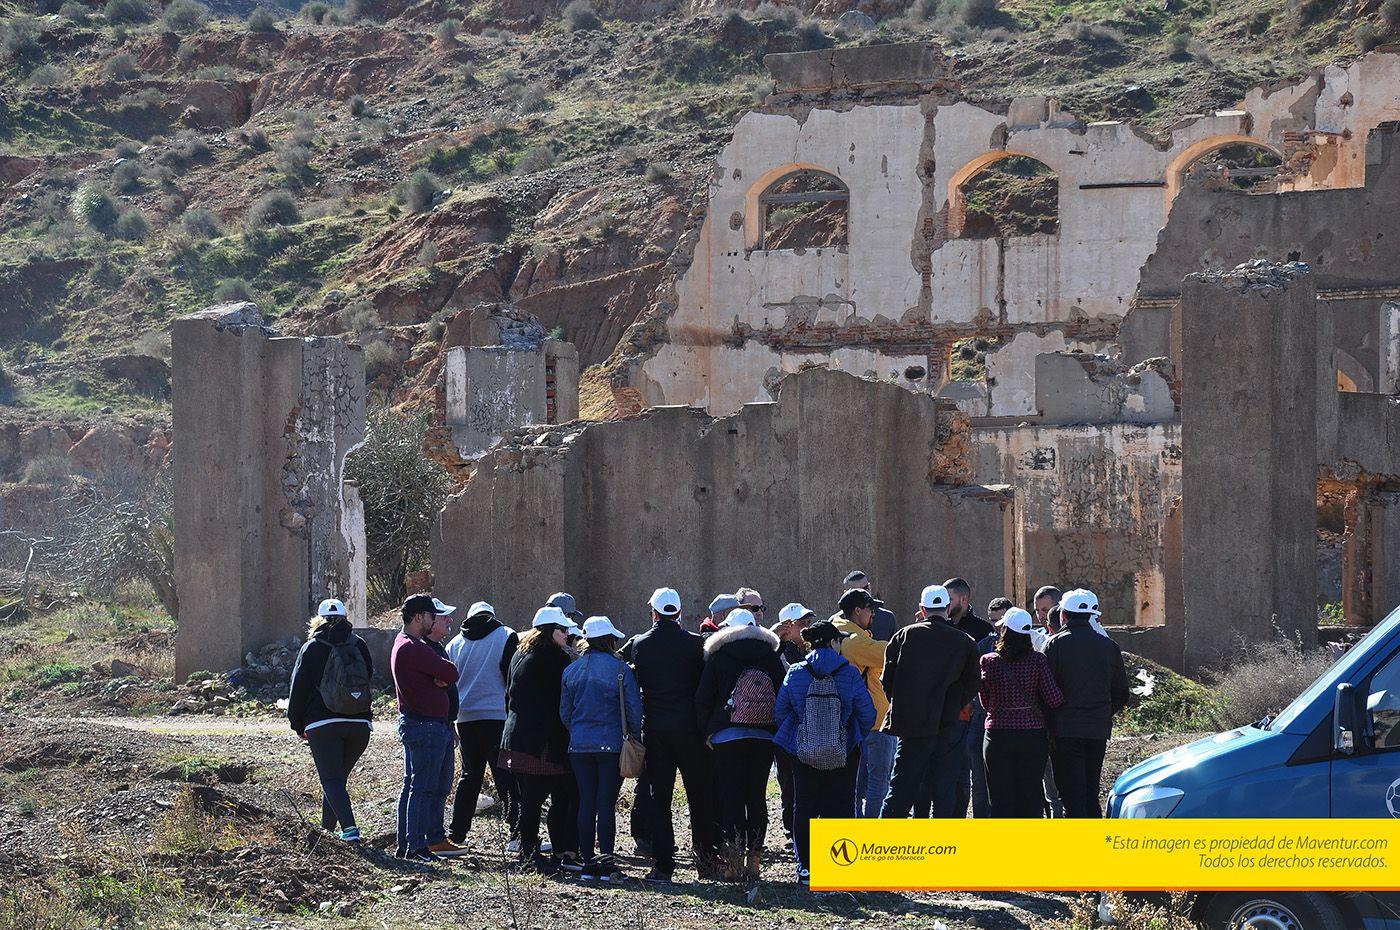 excursion de 1 día a las minas de rif uixan maventur desde melilla nador